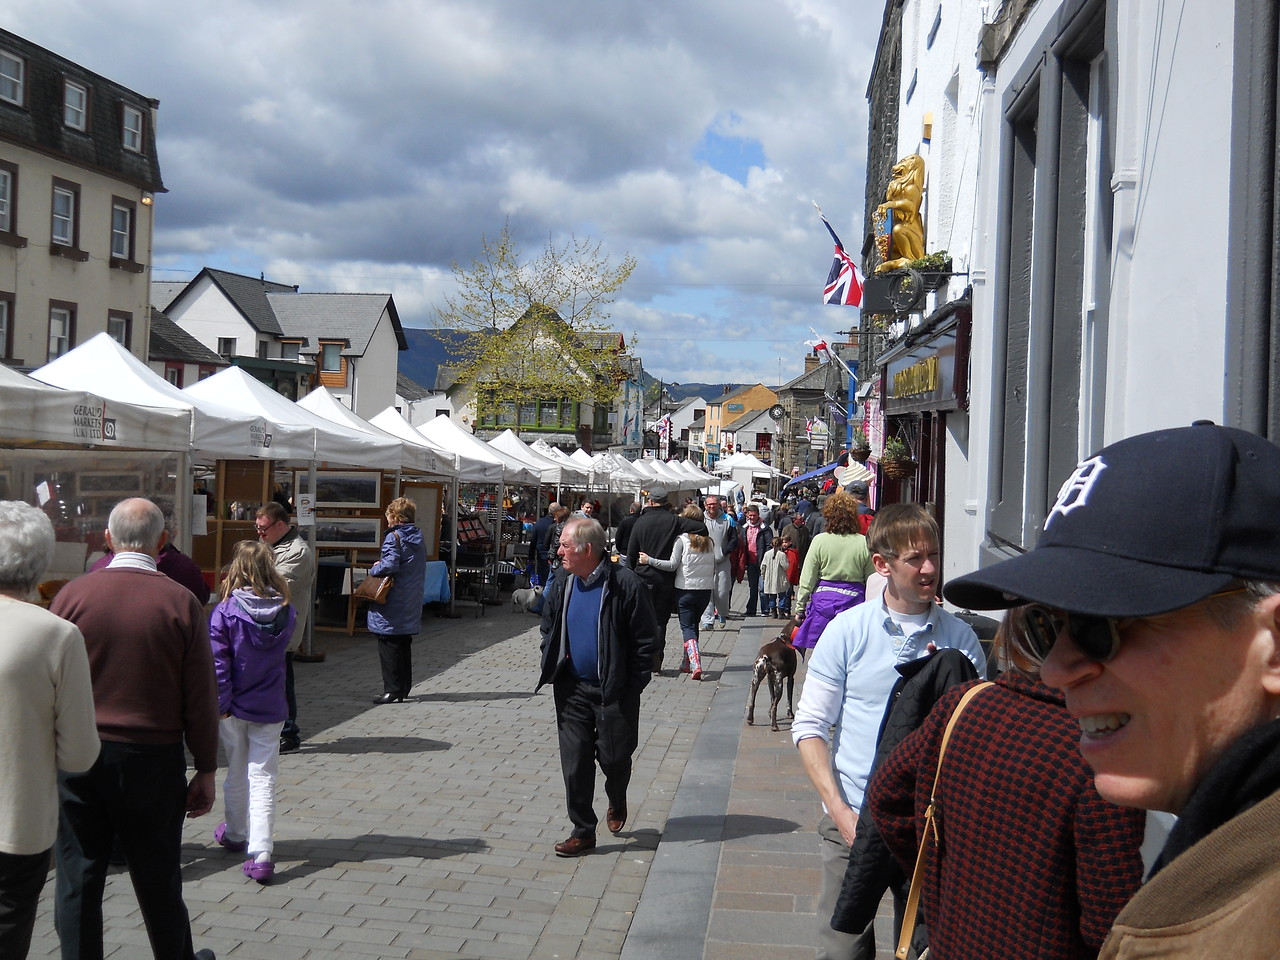 Saturday, May 12 - Downtown Keswick on market day